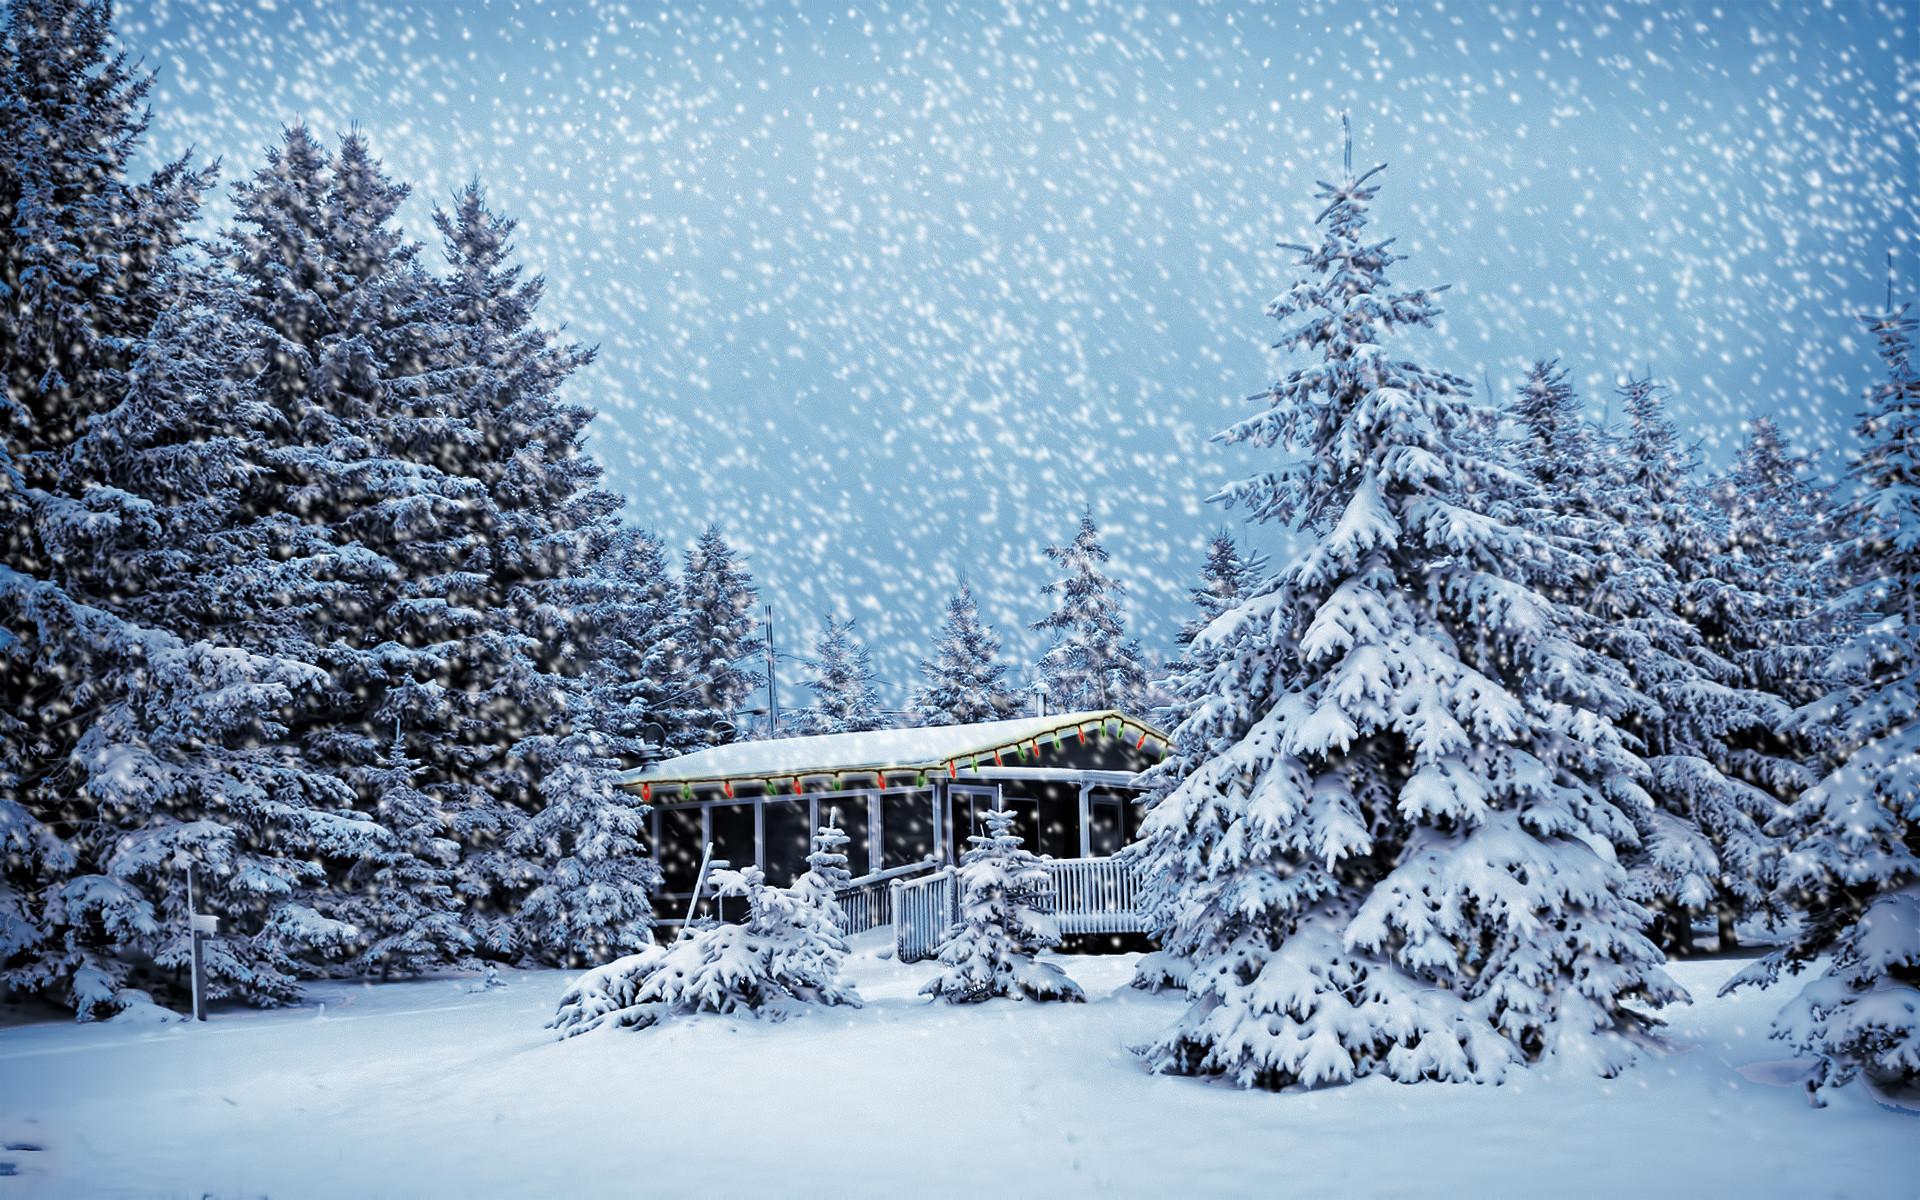 christmas_snowstorm_by_frankief-d4ju852